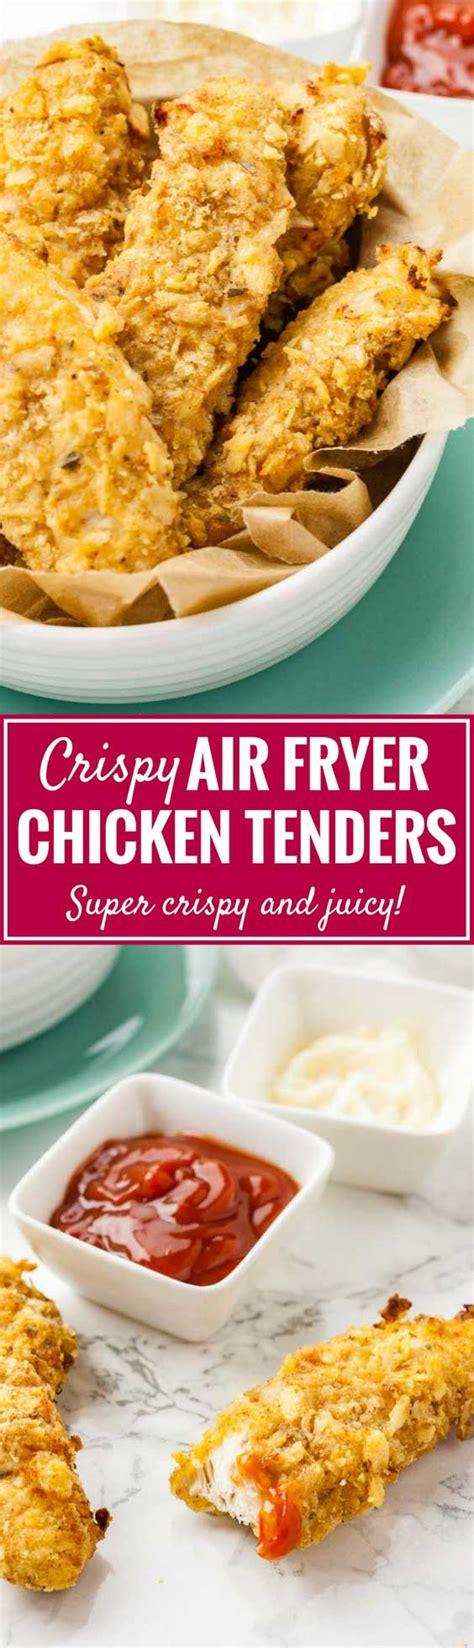 chicken fryer air tenders crispy recipes fingers homemade platedcravings cravings fried strips recipe breaded fry juicy buttermilk long kfc panko